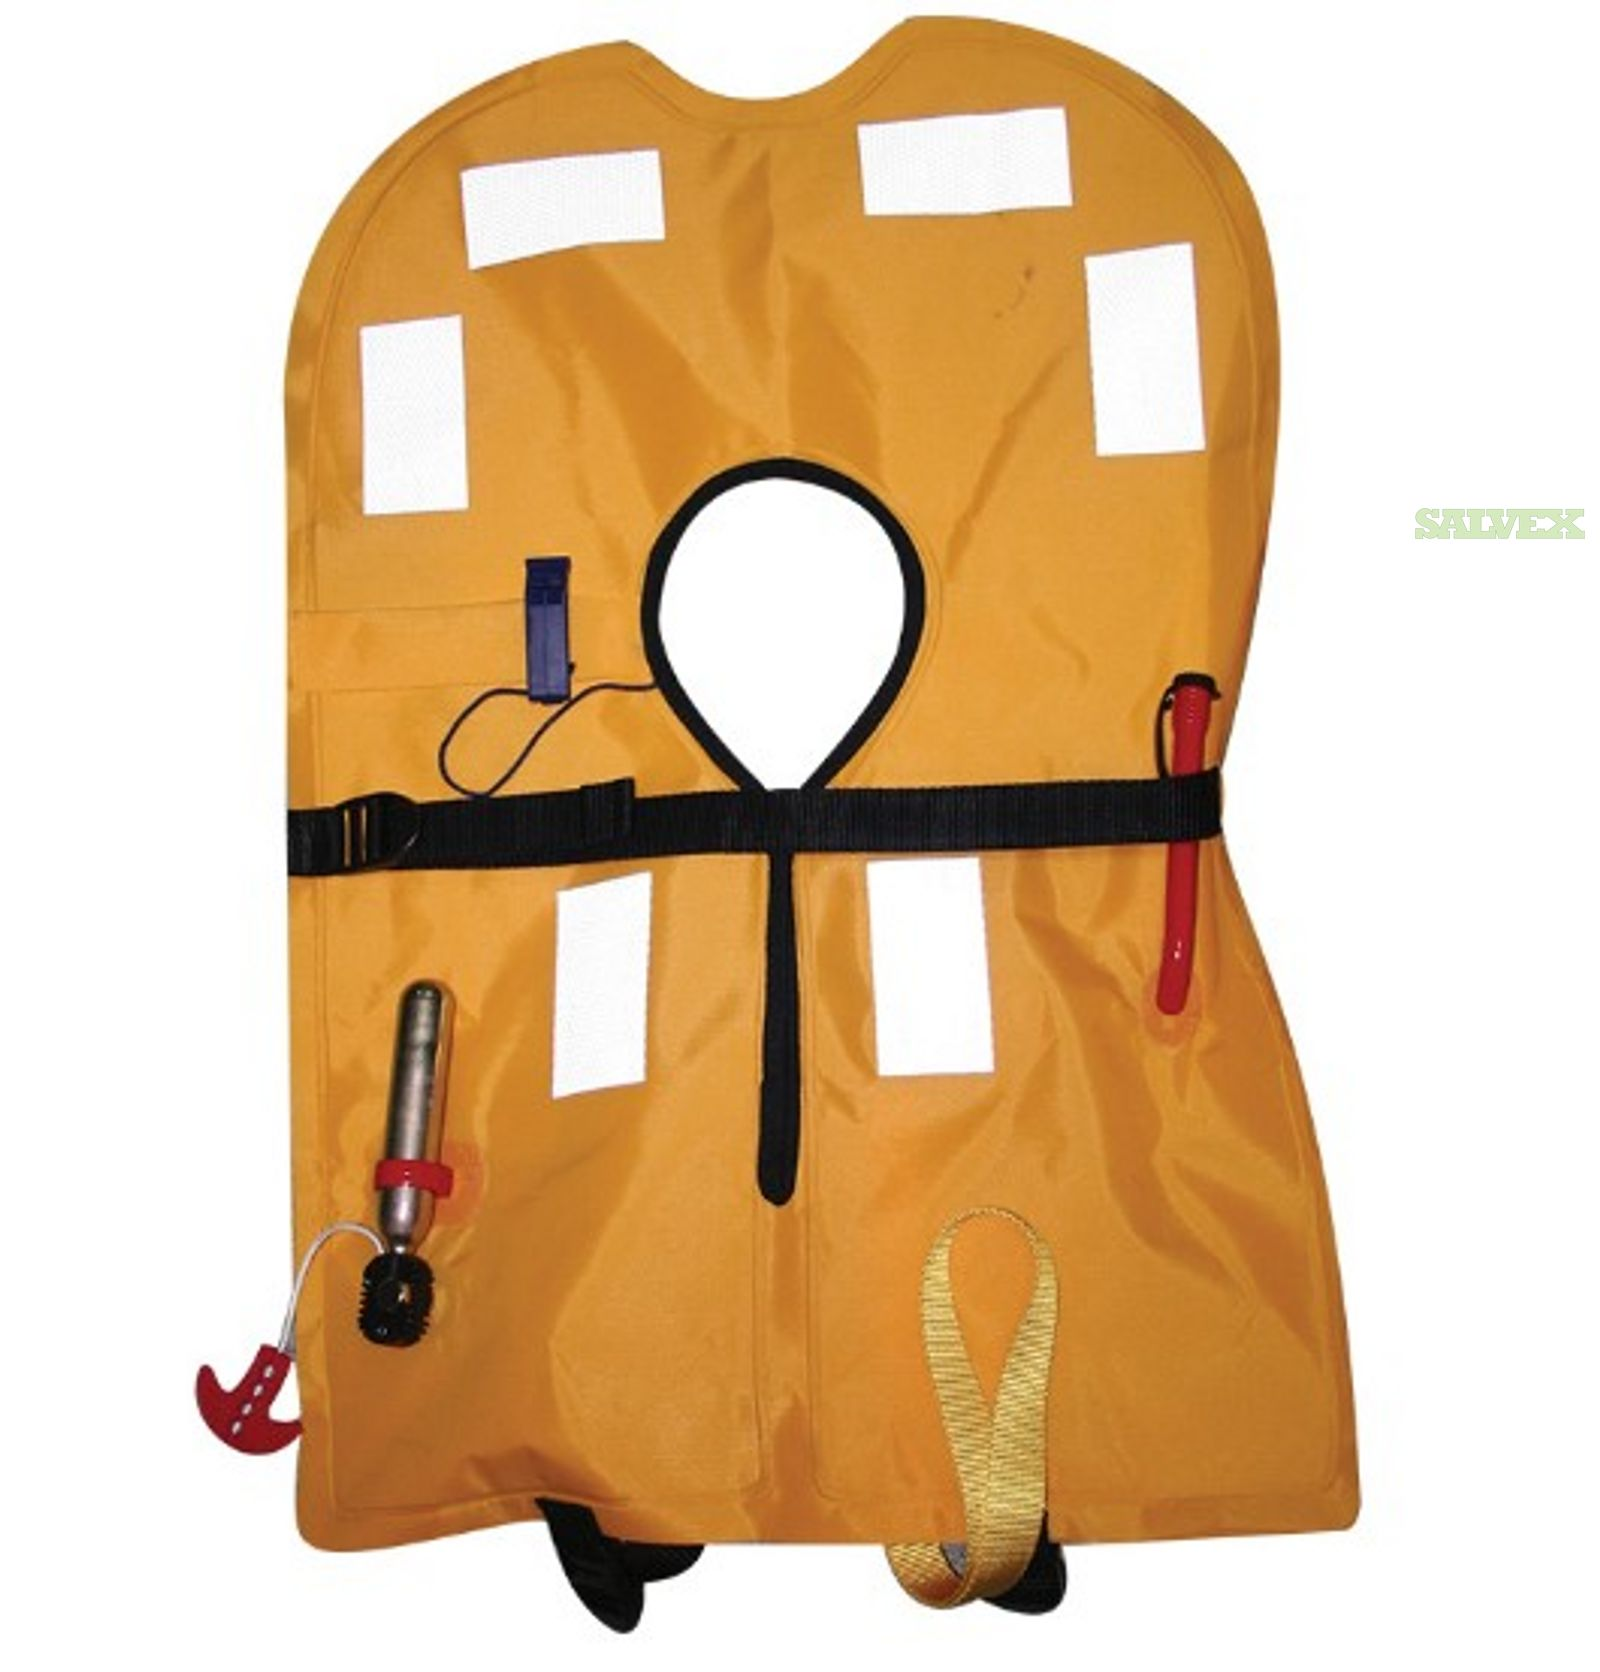 Delta Inflatable Lifejacket Belt-Pack, 150N, ISO 12402-3 (78 Units)